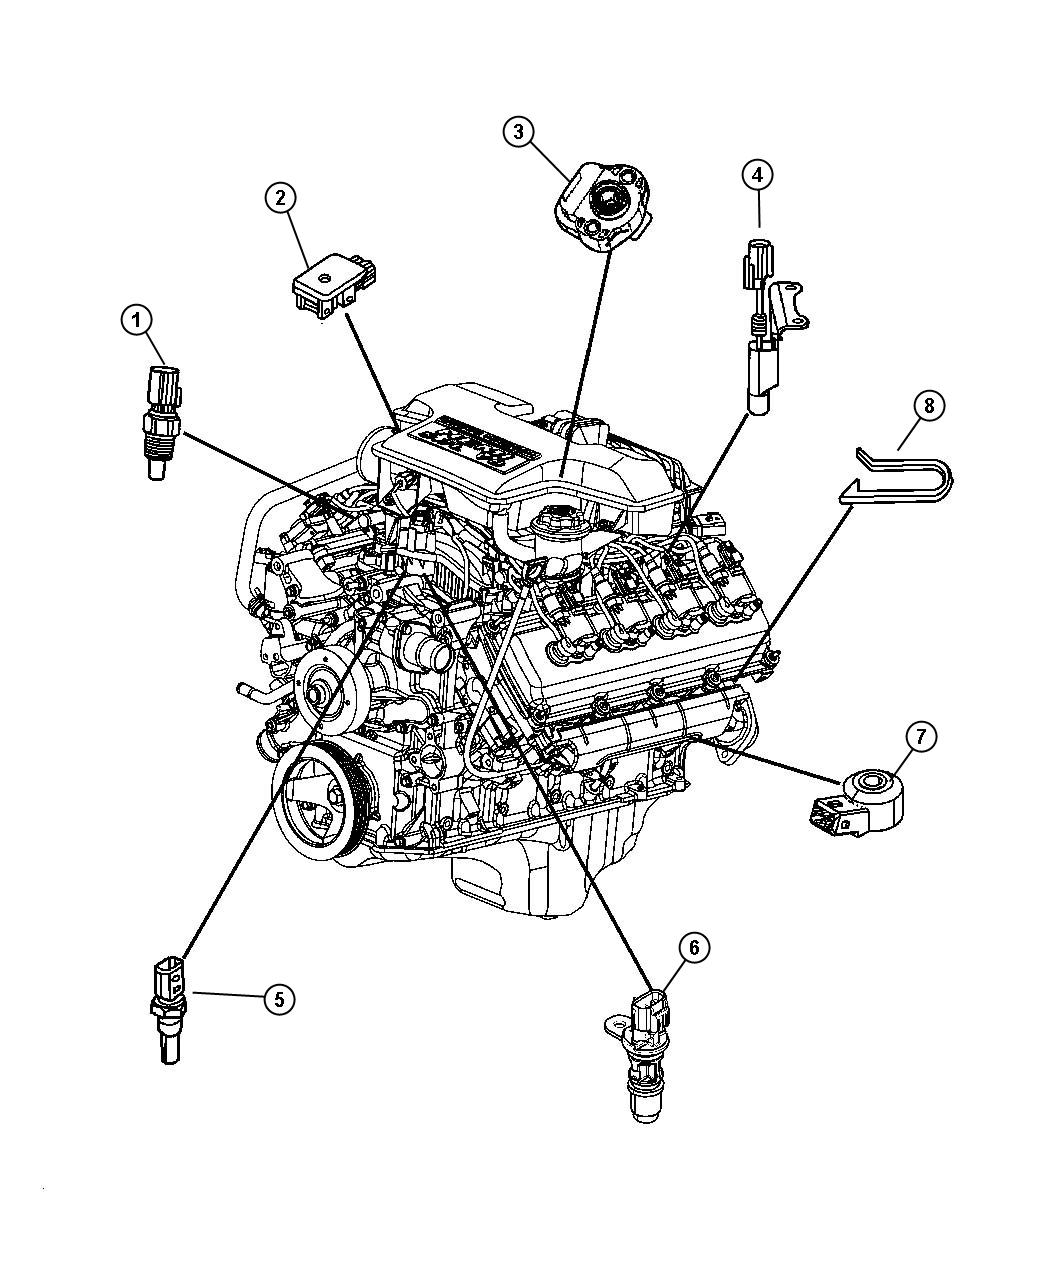 Dodge Ram Sensor Map After 01 06 06 Up To 01 11 06